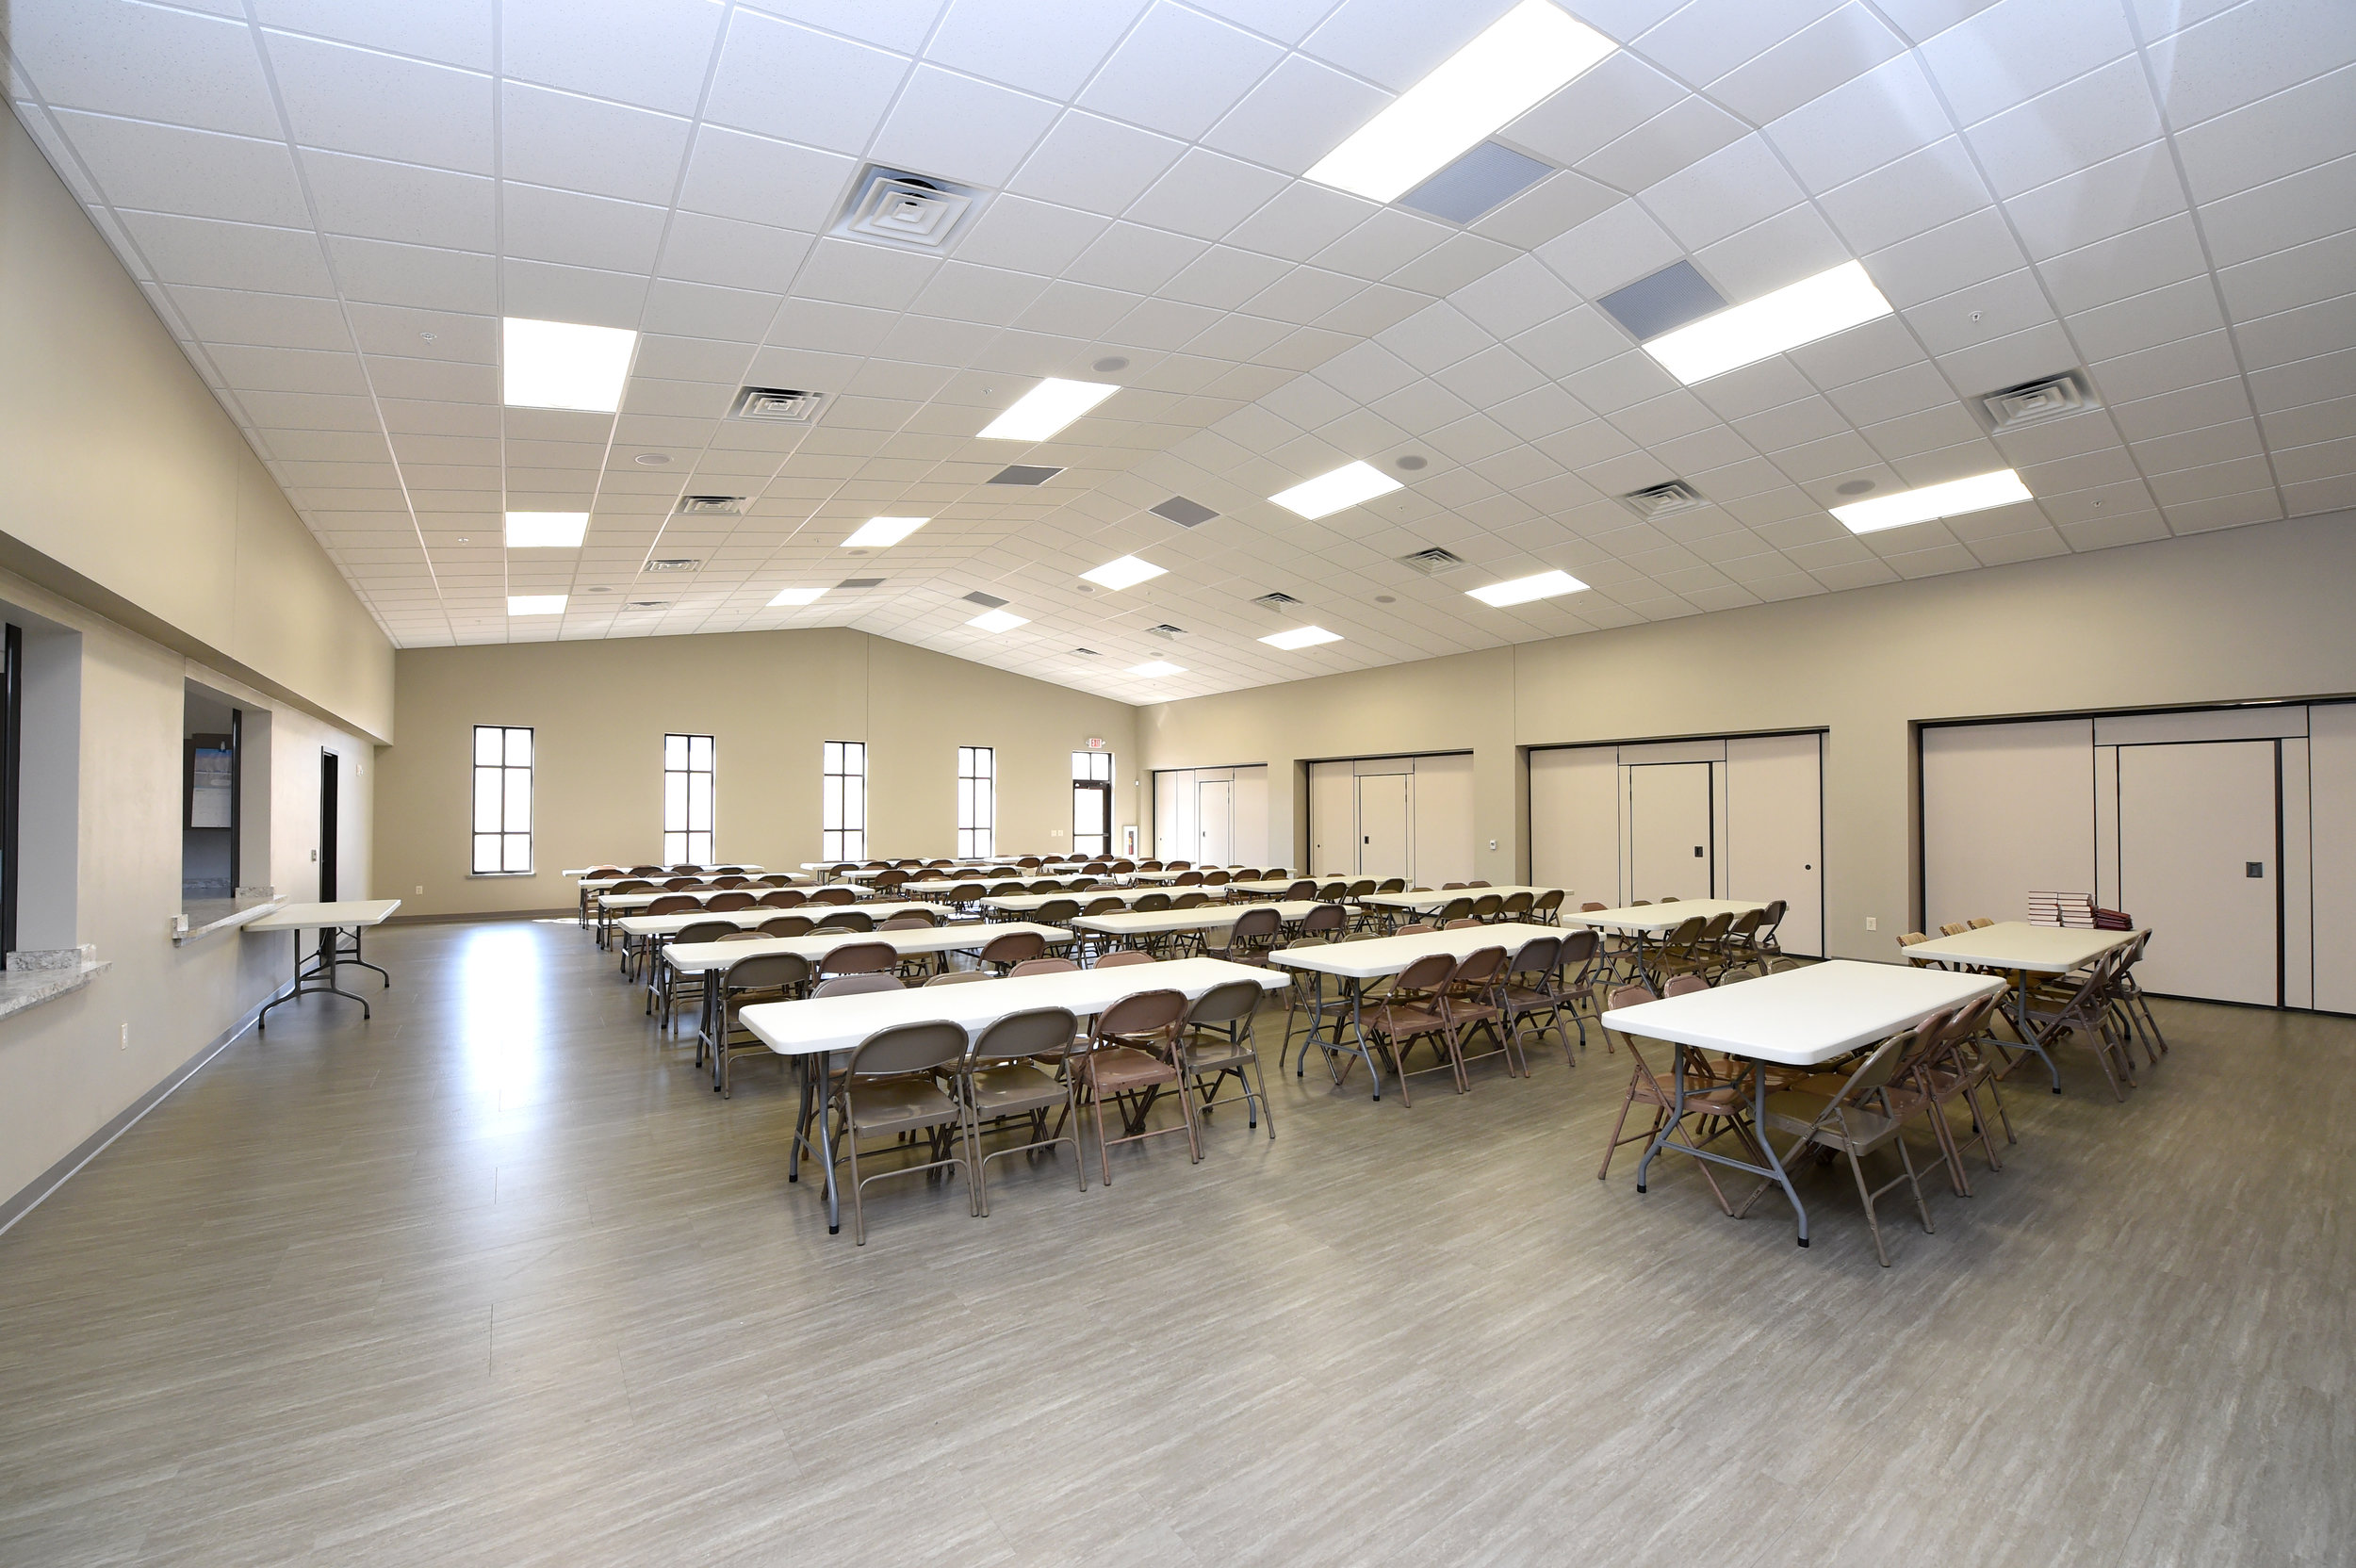 Bethlehem Lutheran Church Hall Space